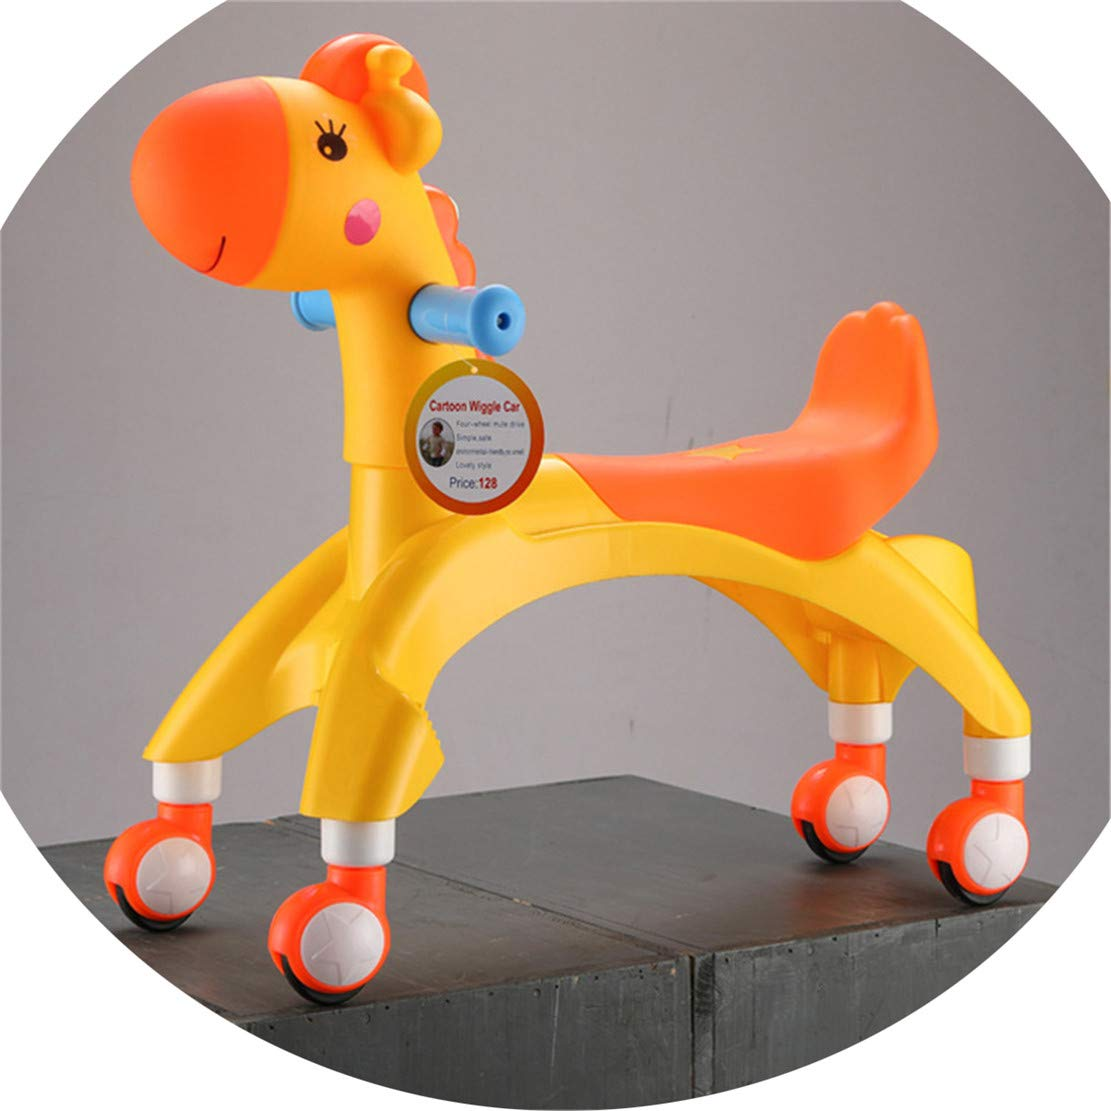 WEIGZ Kids Sneak car Twist car Toddler high Mute Belt Music yo-Yo car,Yellow